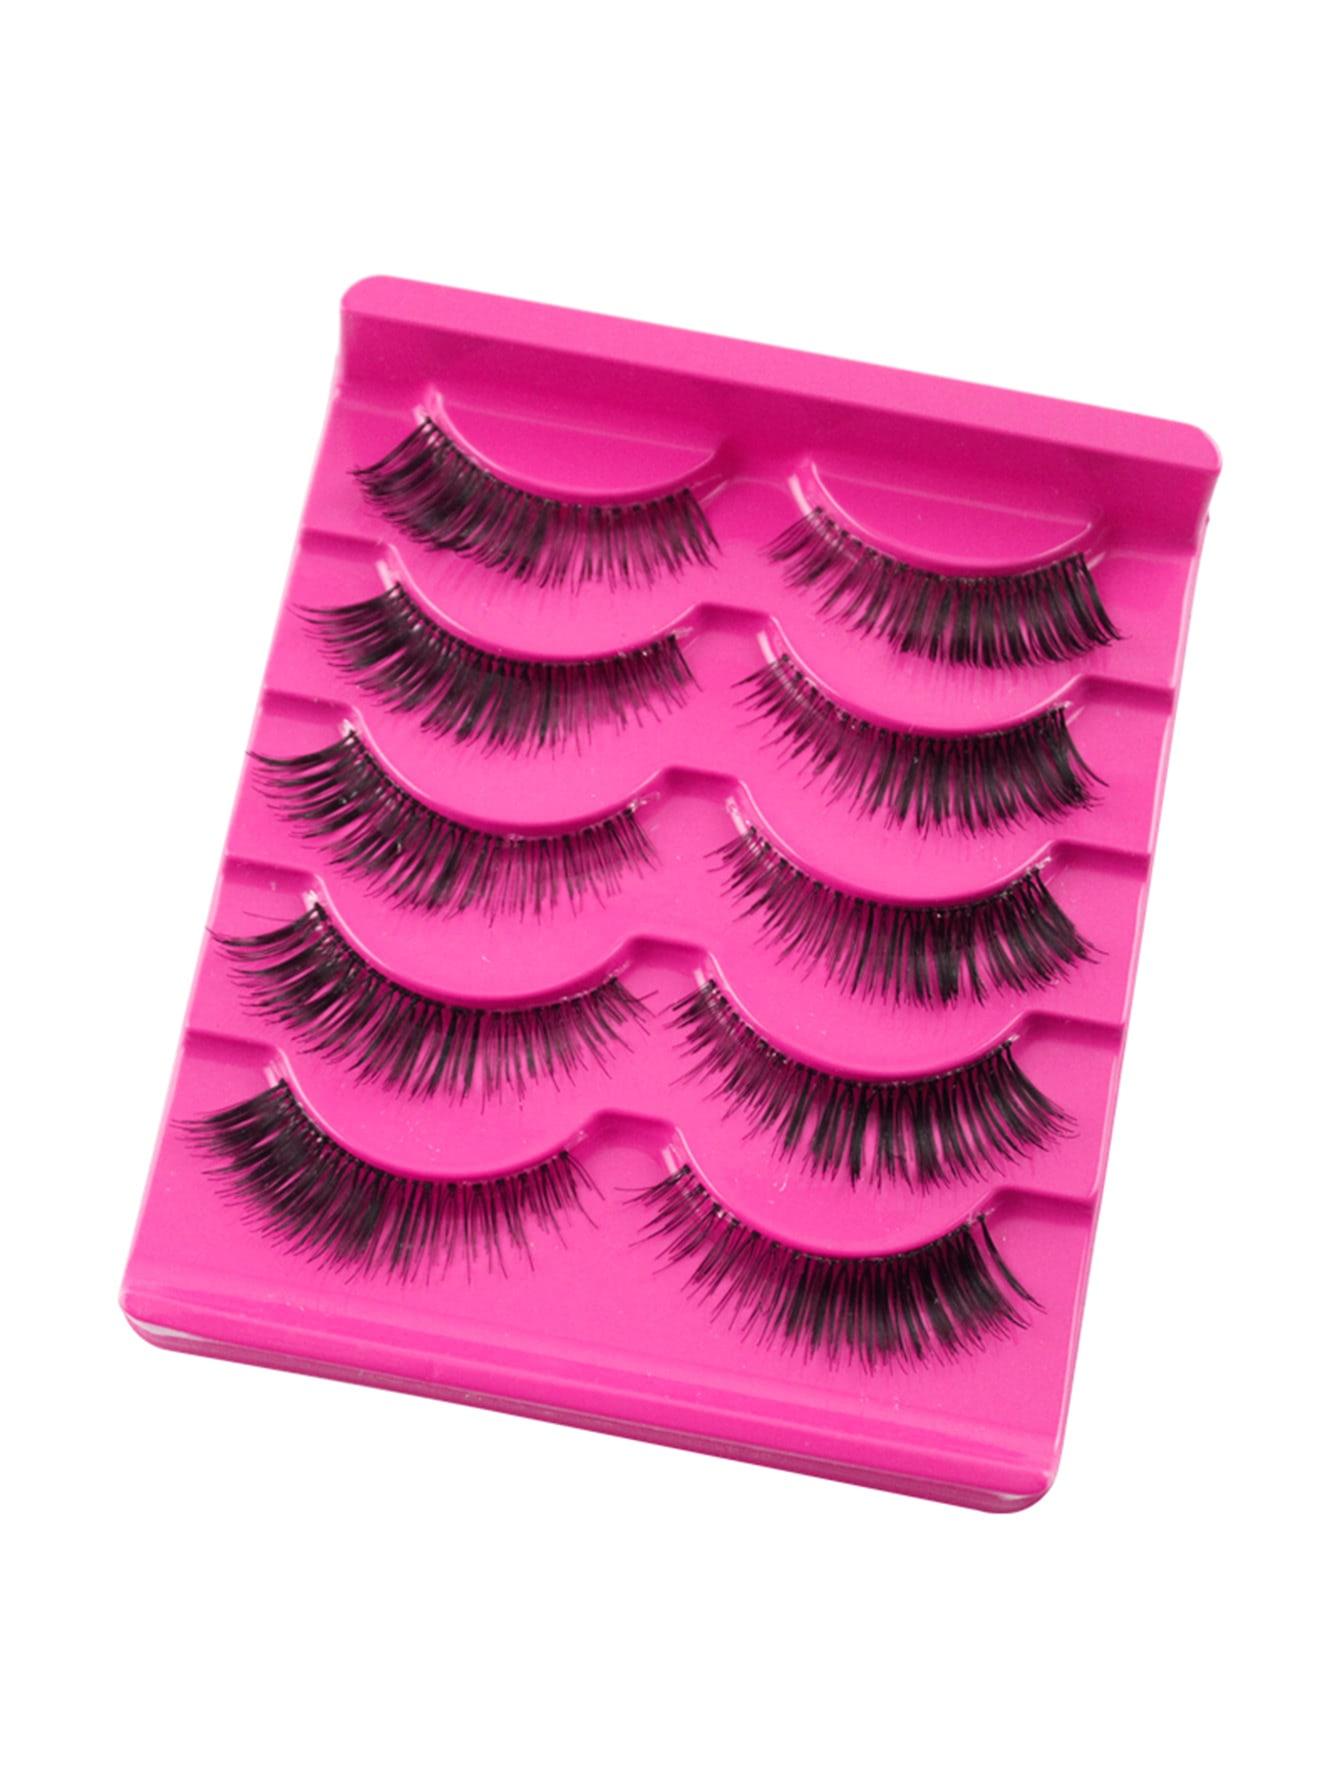 Natural False Eyelashes Set 5 Pair beauty170403322